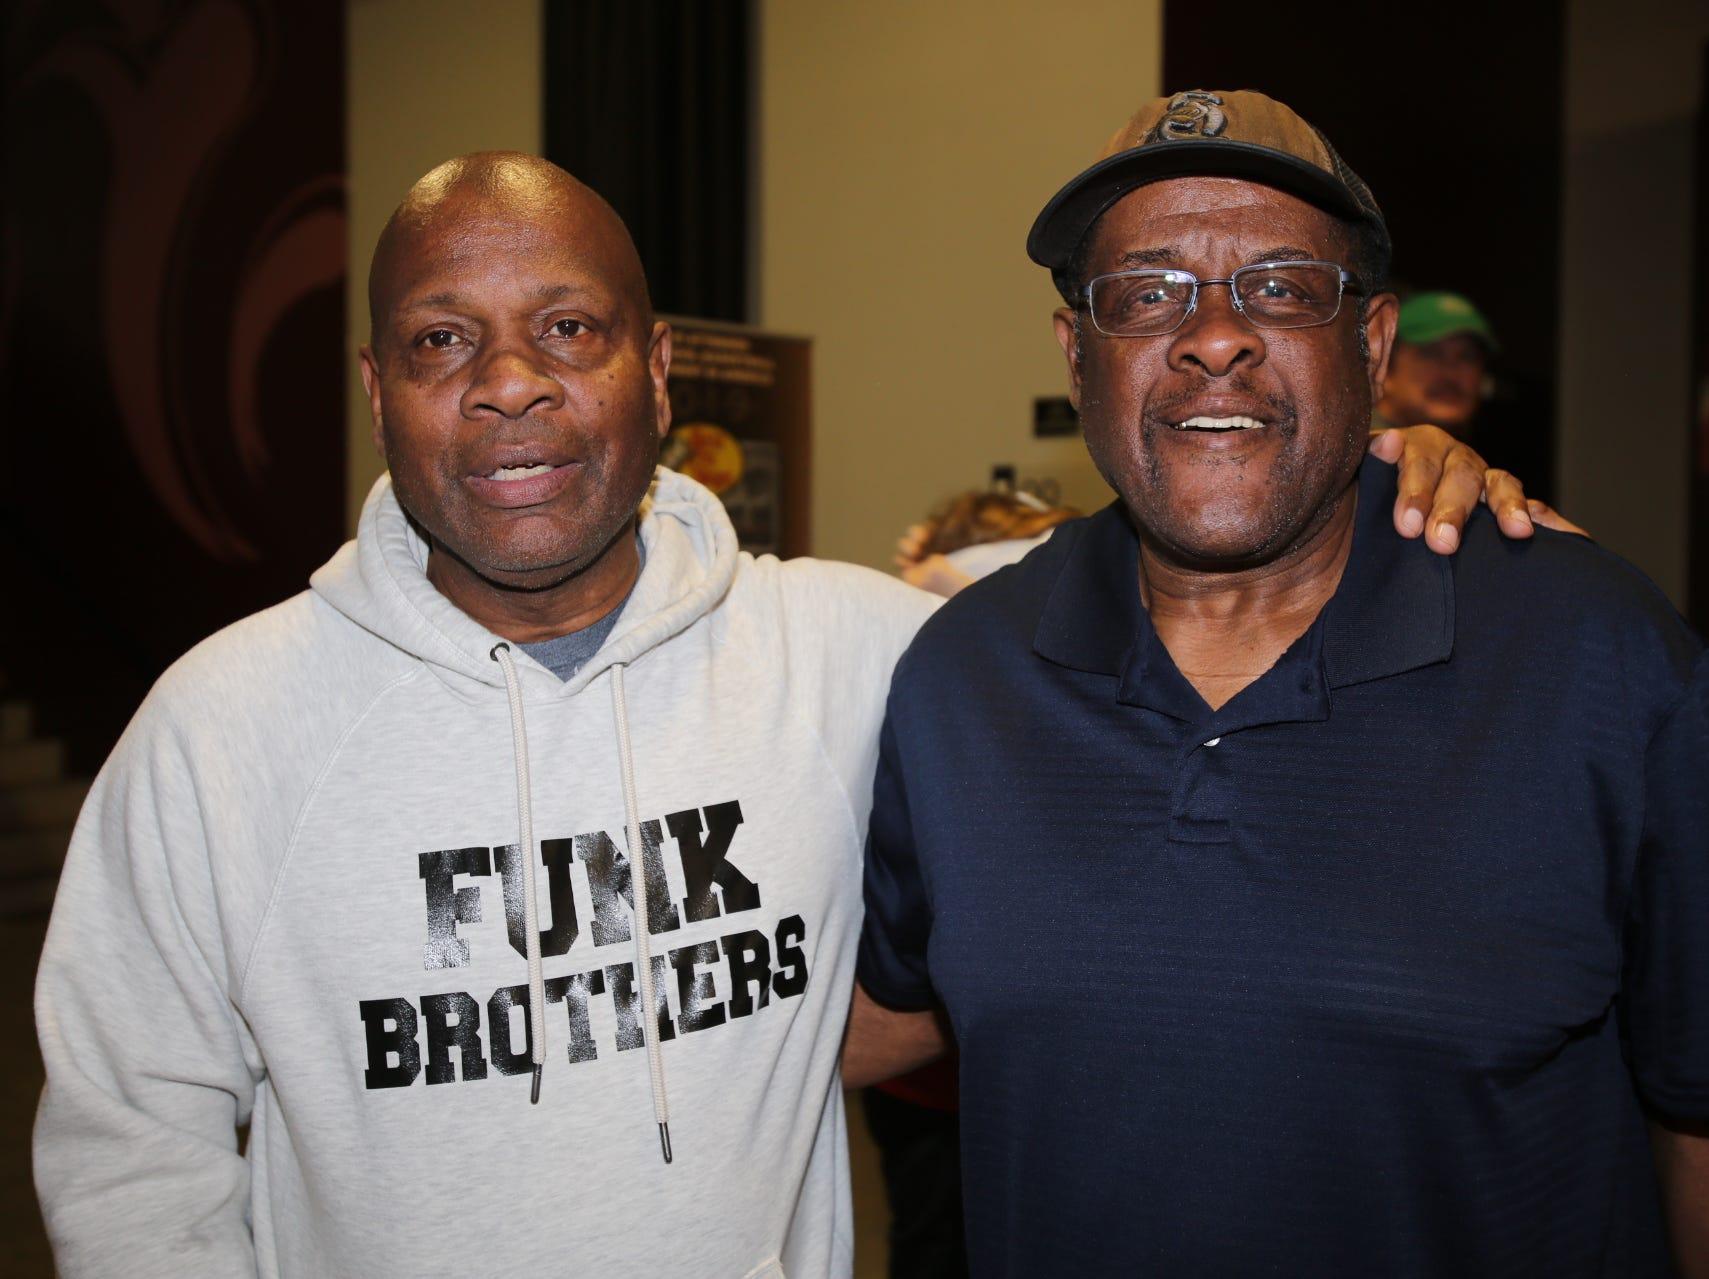 Ron Jarrett and Garland Adams